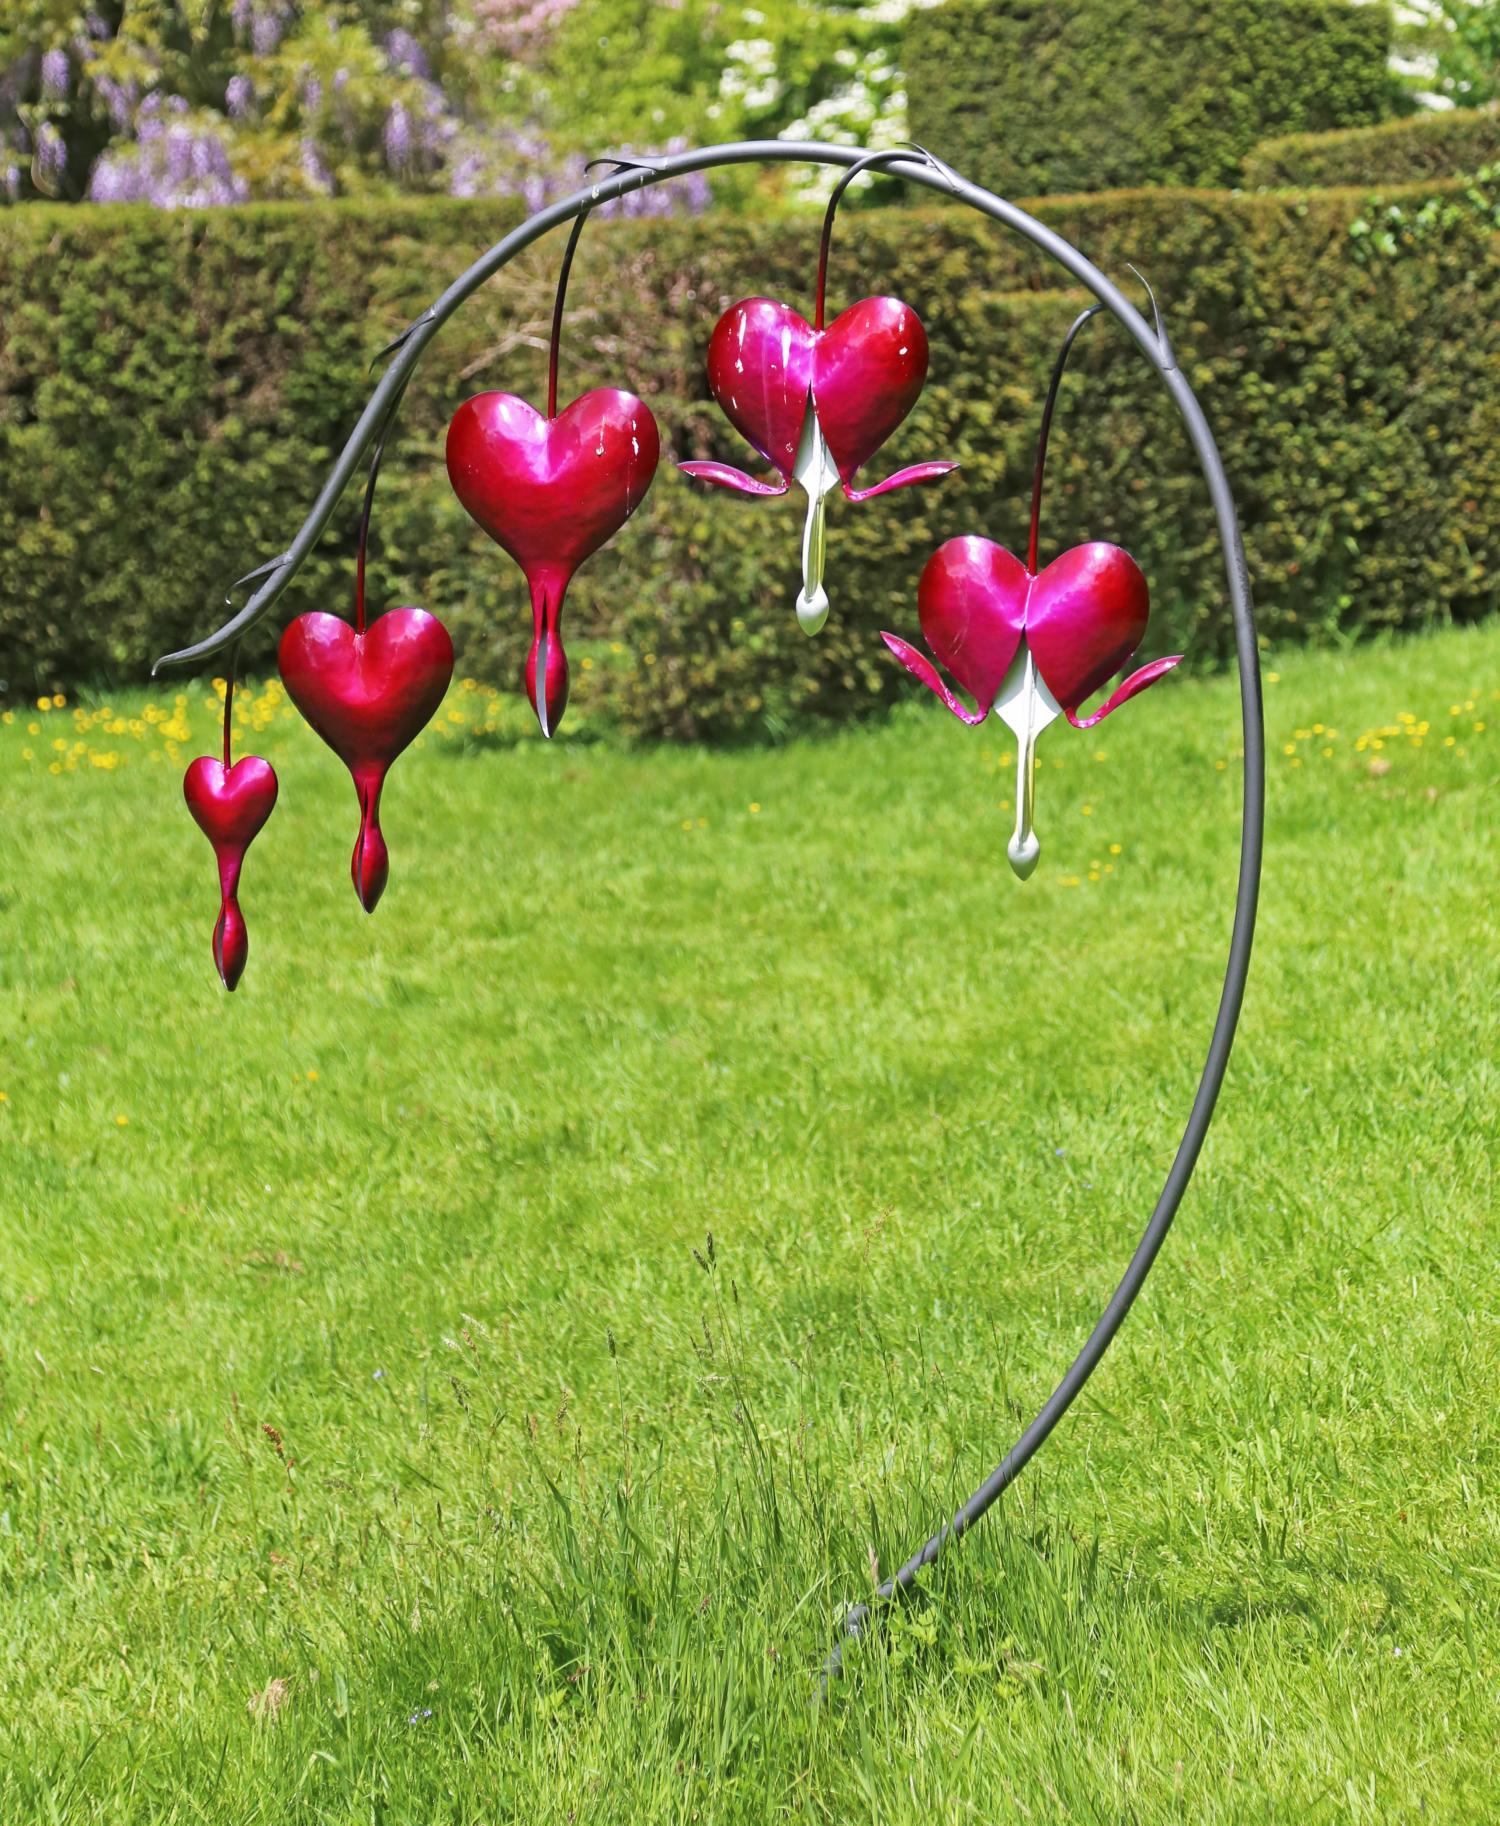 Lot 28 - Sculpture: Dicentra Bleeding Heart, Missfire, Glass & steel, 170cm high by 120cm wide by 90cm deep